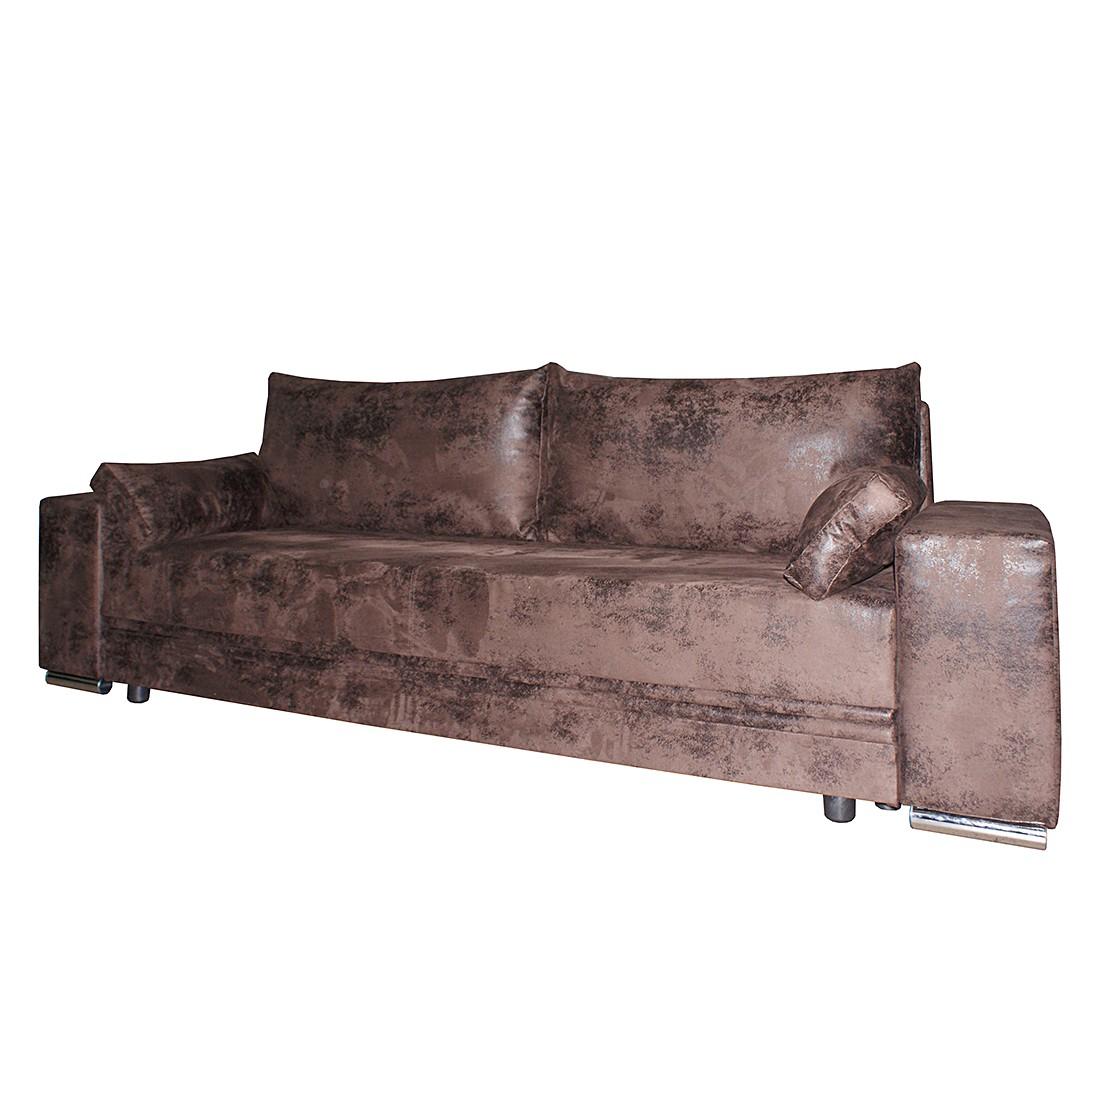 Schlafsofa City Lounge – Microfaser Braun, roomscape günstig